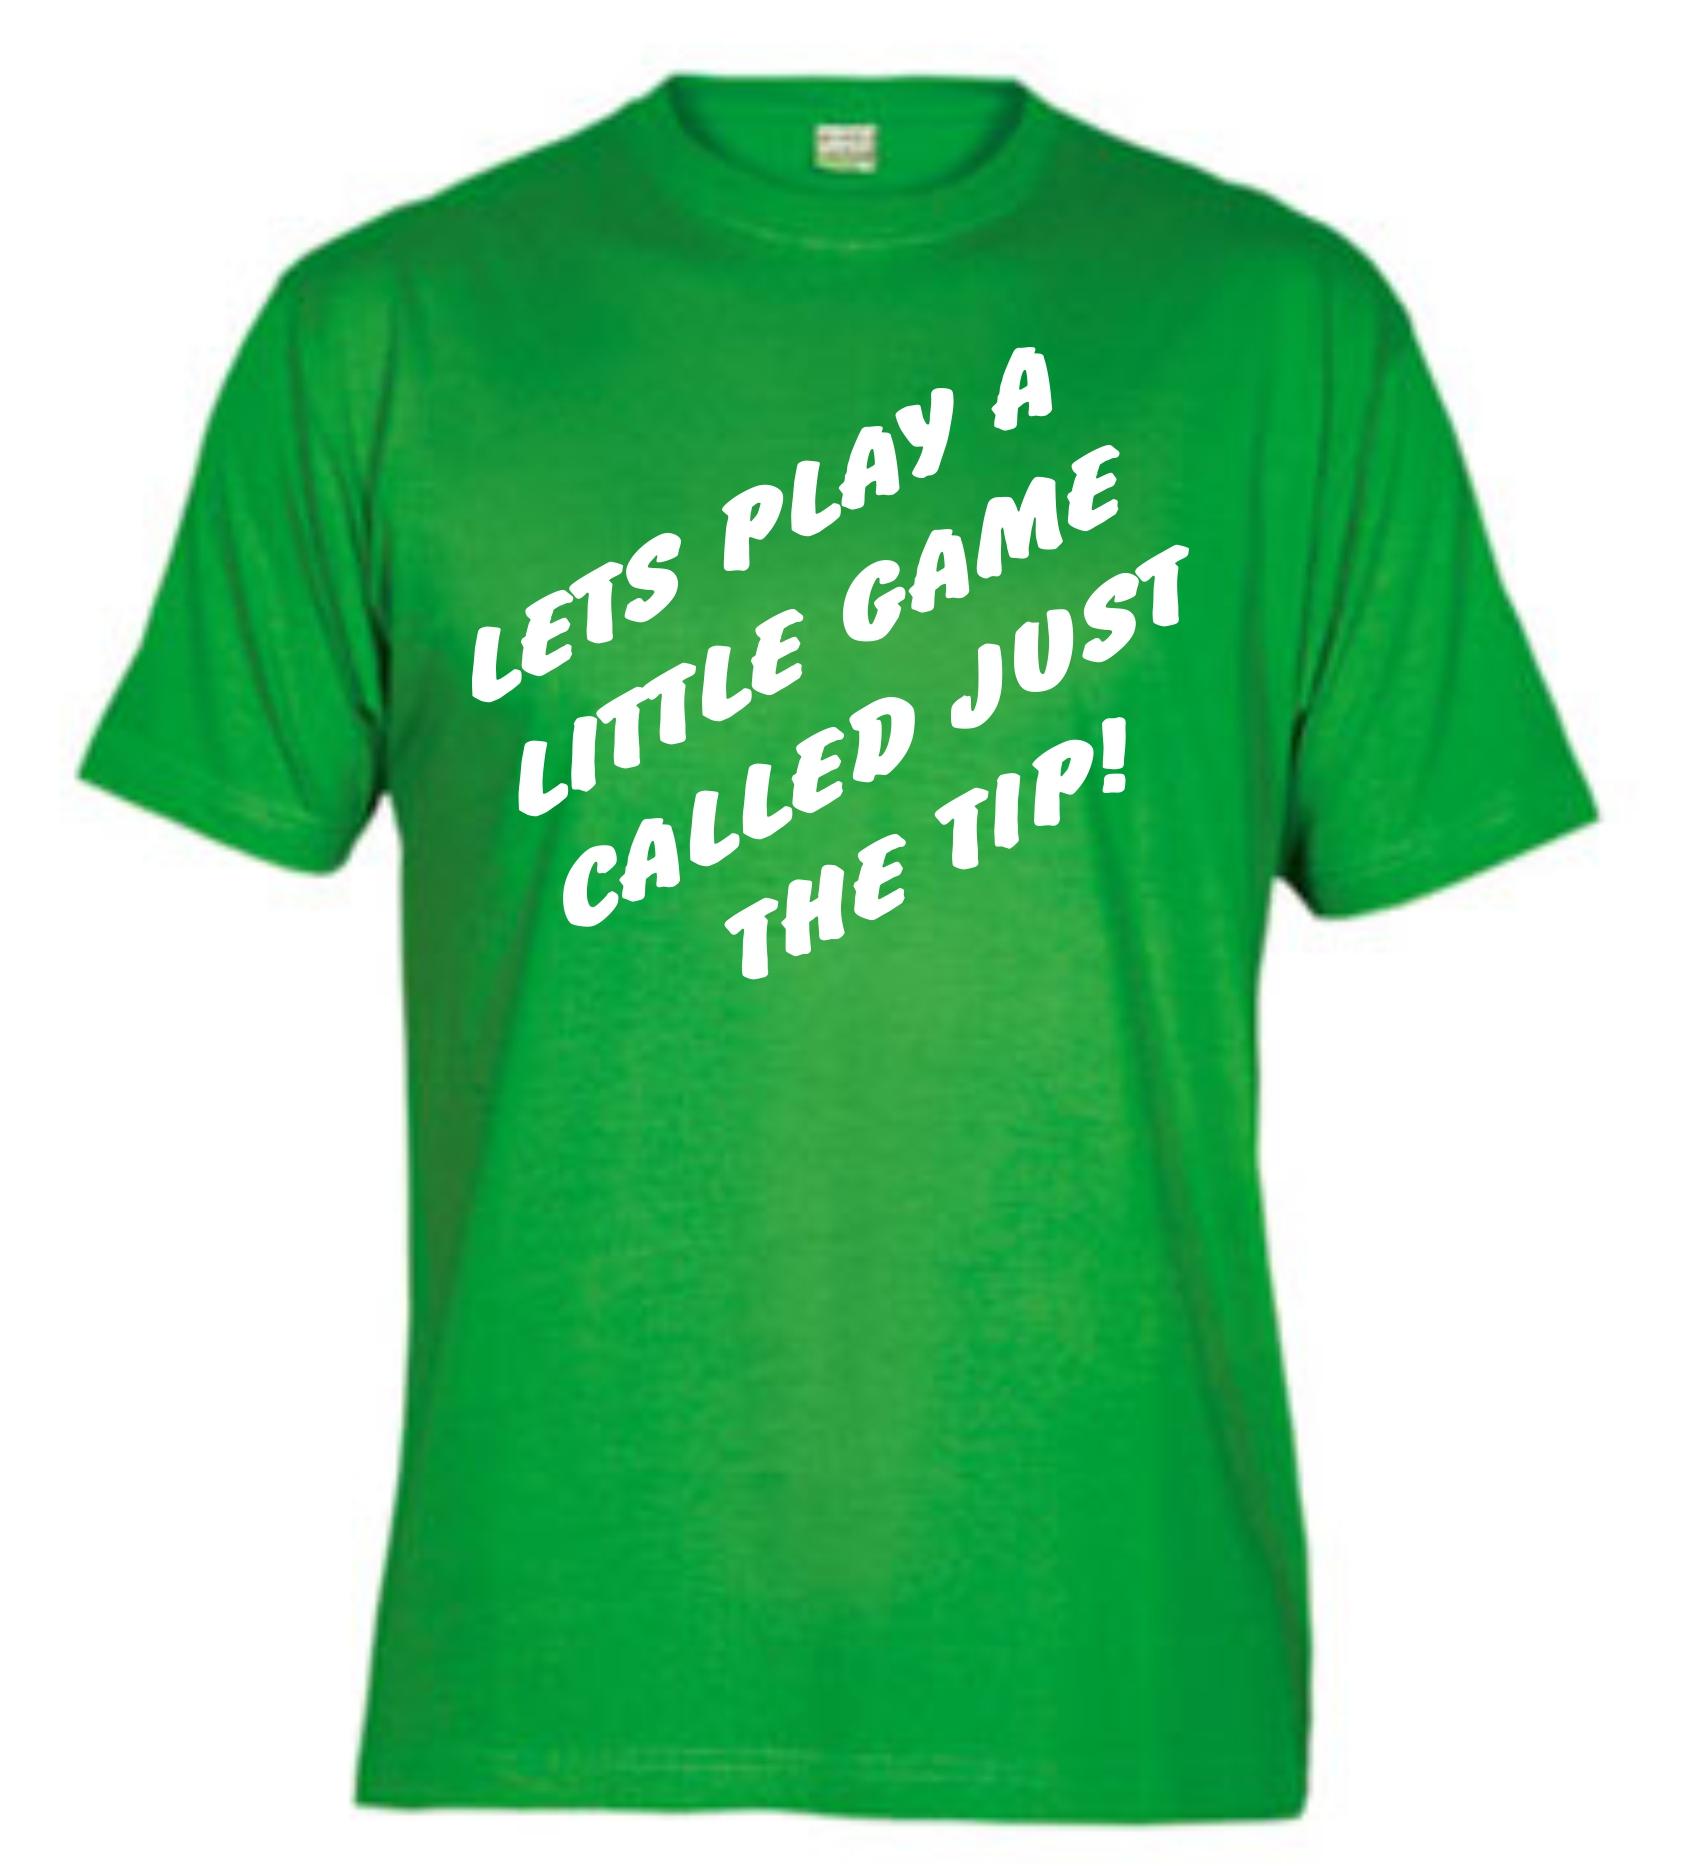 giggity t shirt